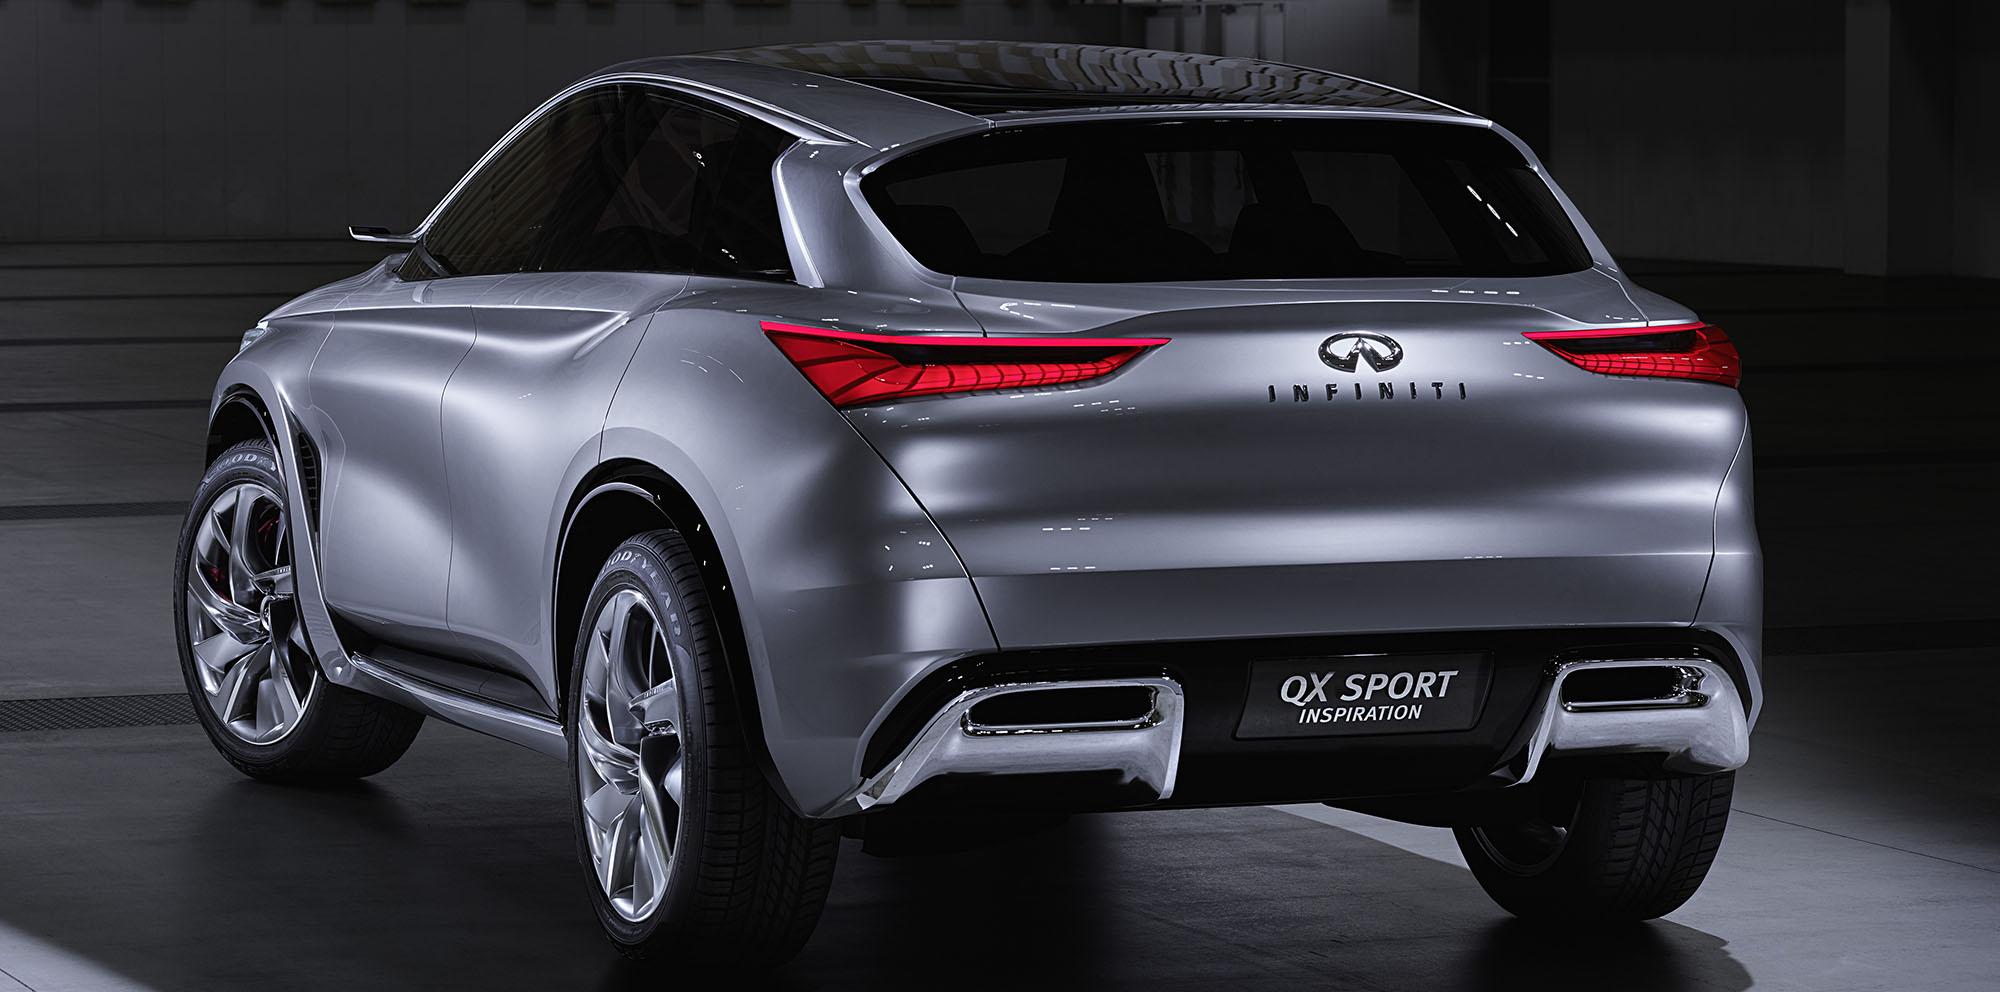 Infiniti QX Sport Inspiration Concept Unveiled, Previews